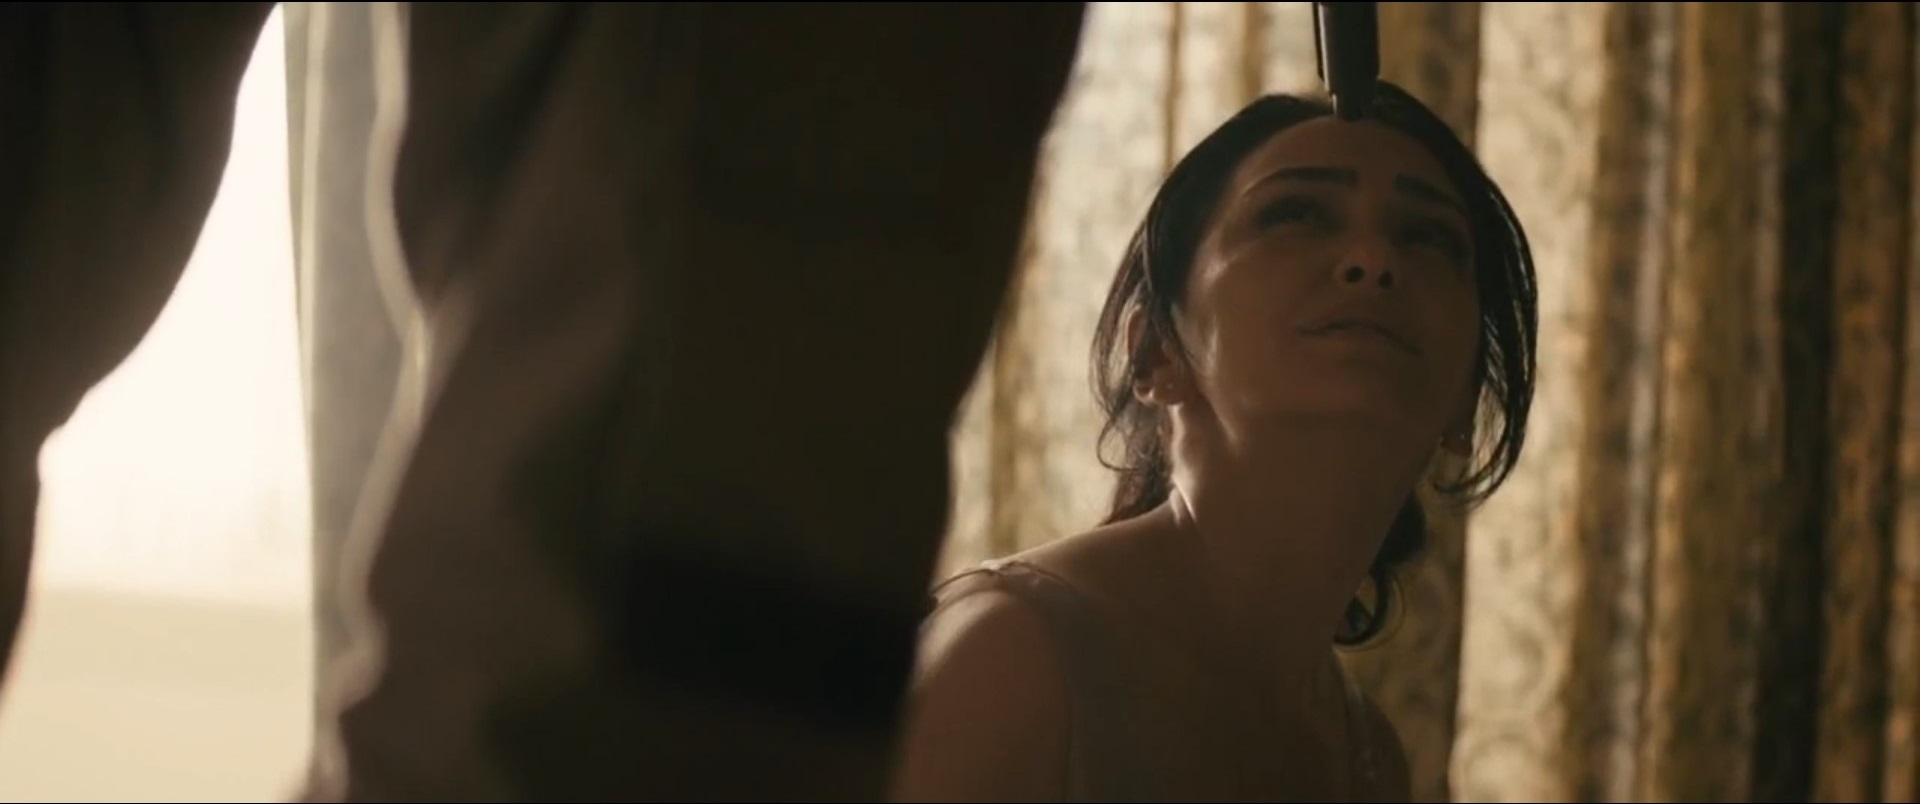 Zahra (Nazanin Boniadi) performing Salat as the terrorist holds his gun to her head in Hotel Mumbai